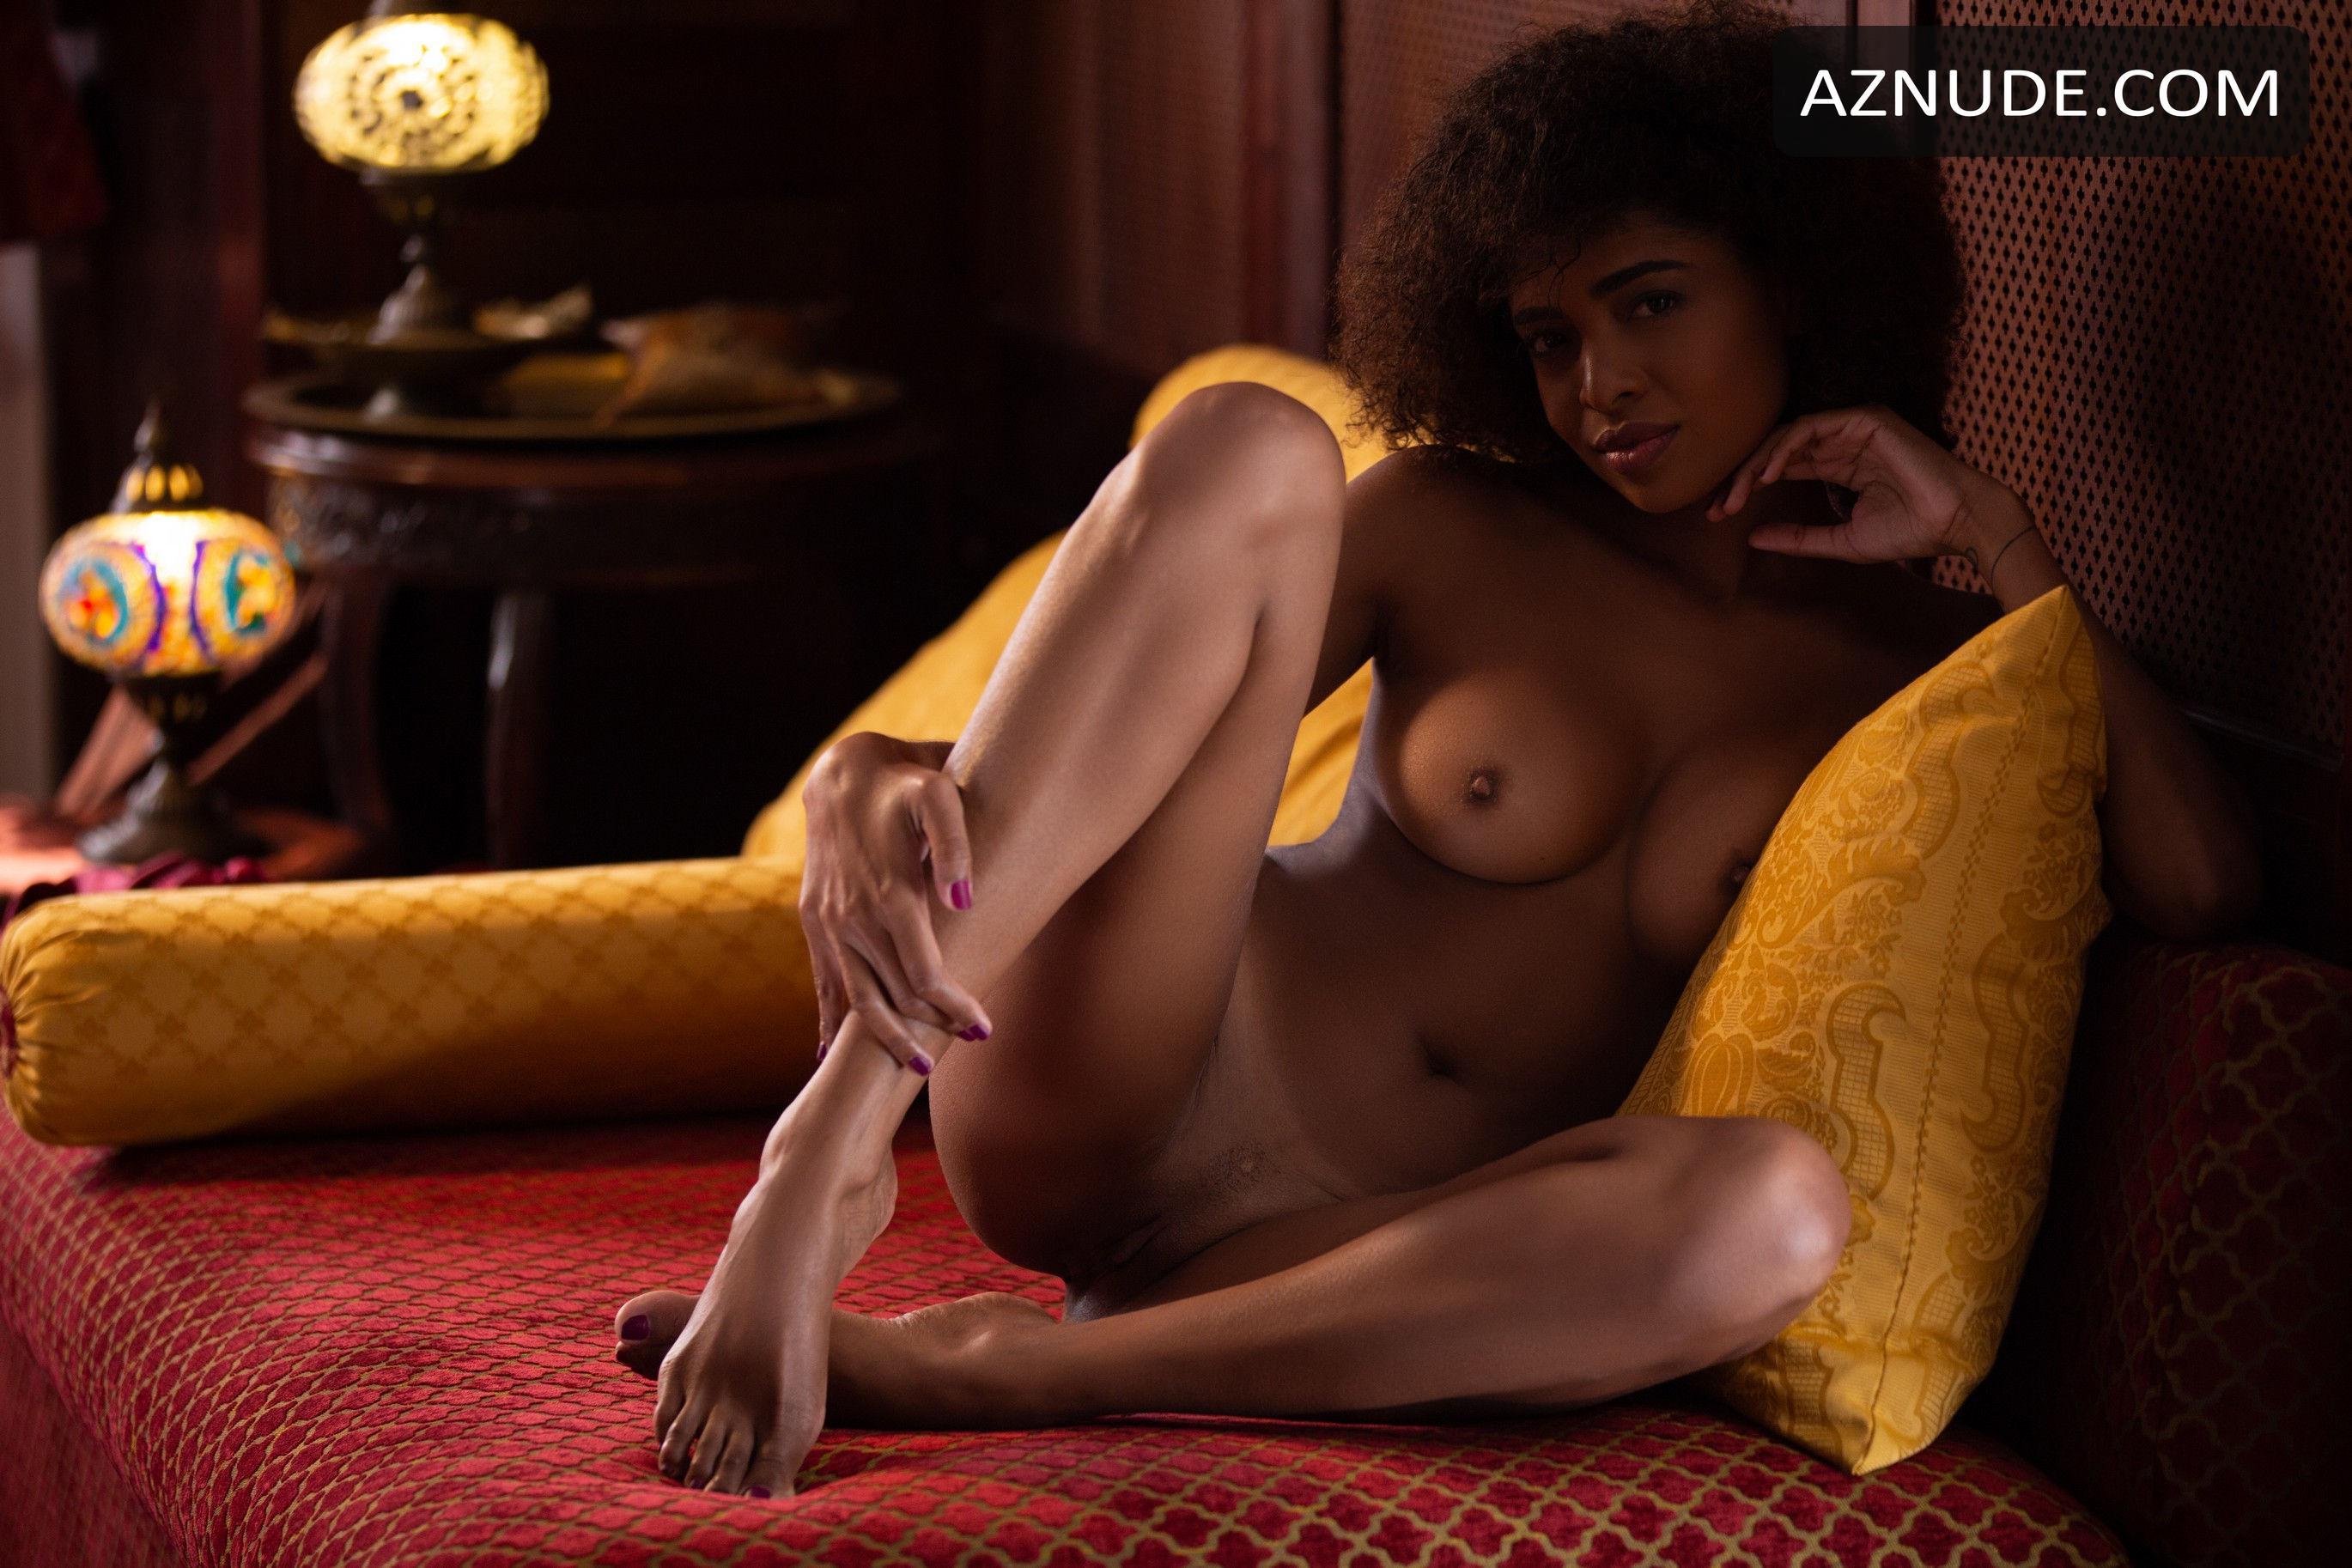 bruna rocha nude